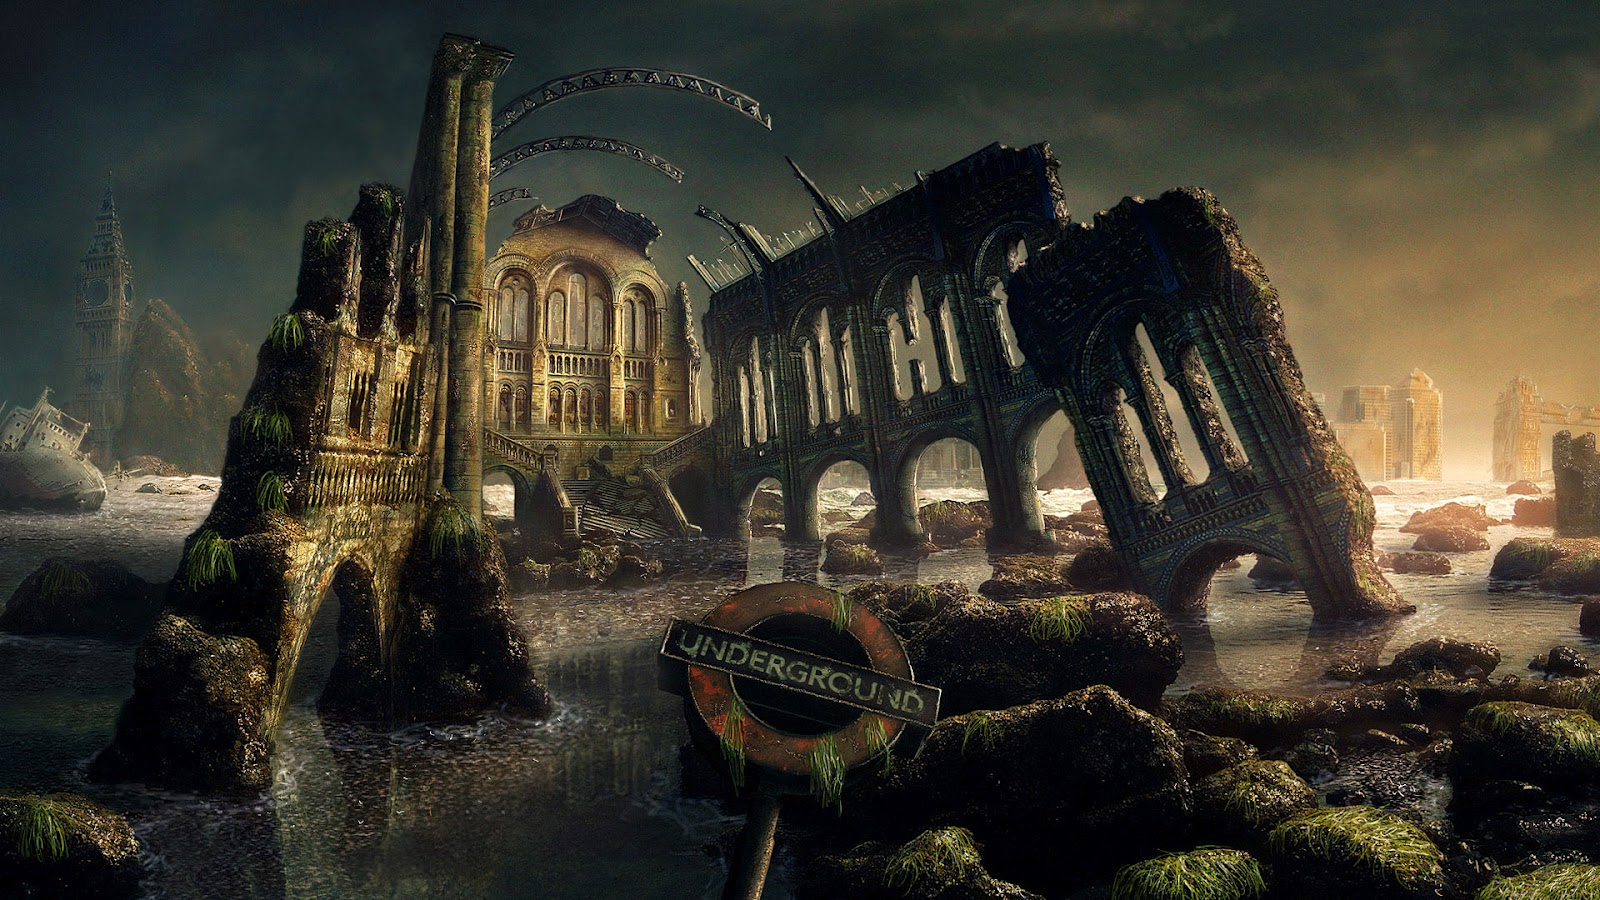 of war map scene wallpaper background 2 scenery landscape epic games 1600x900